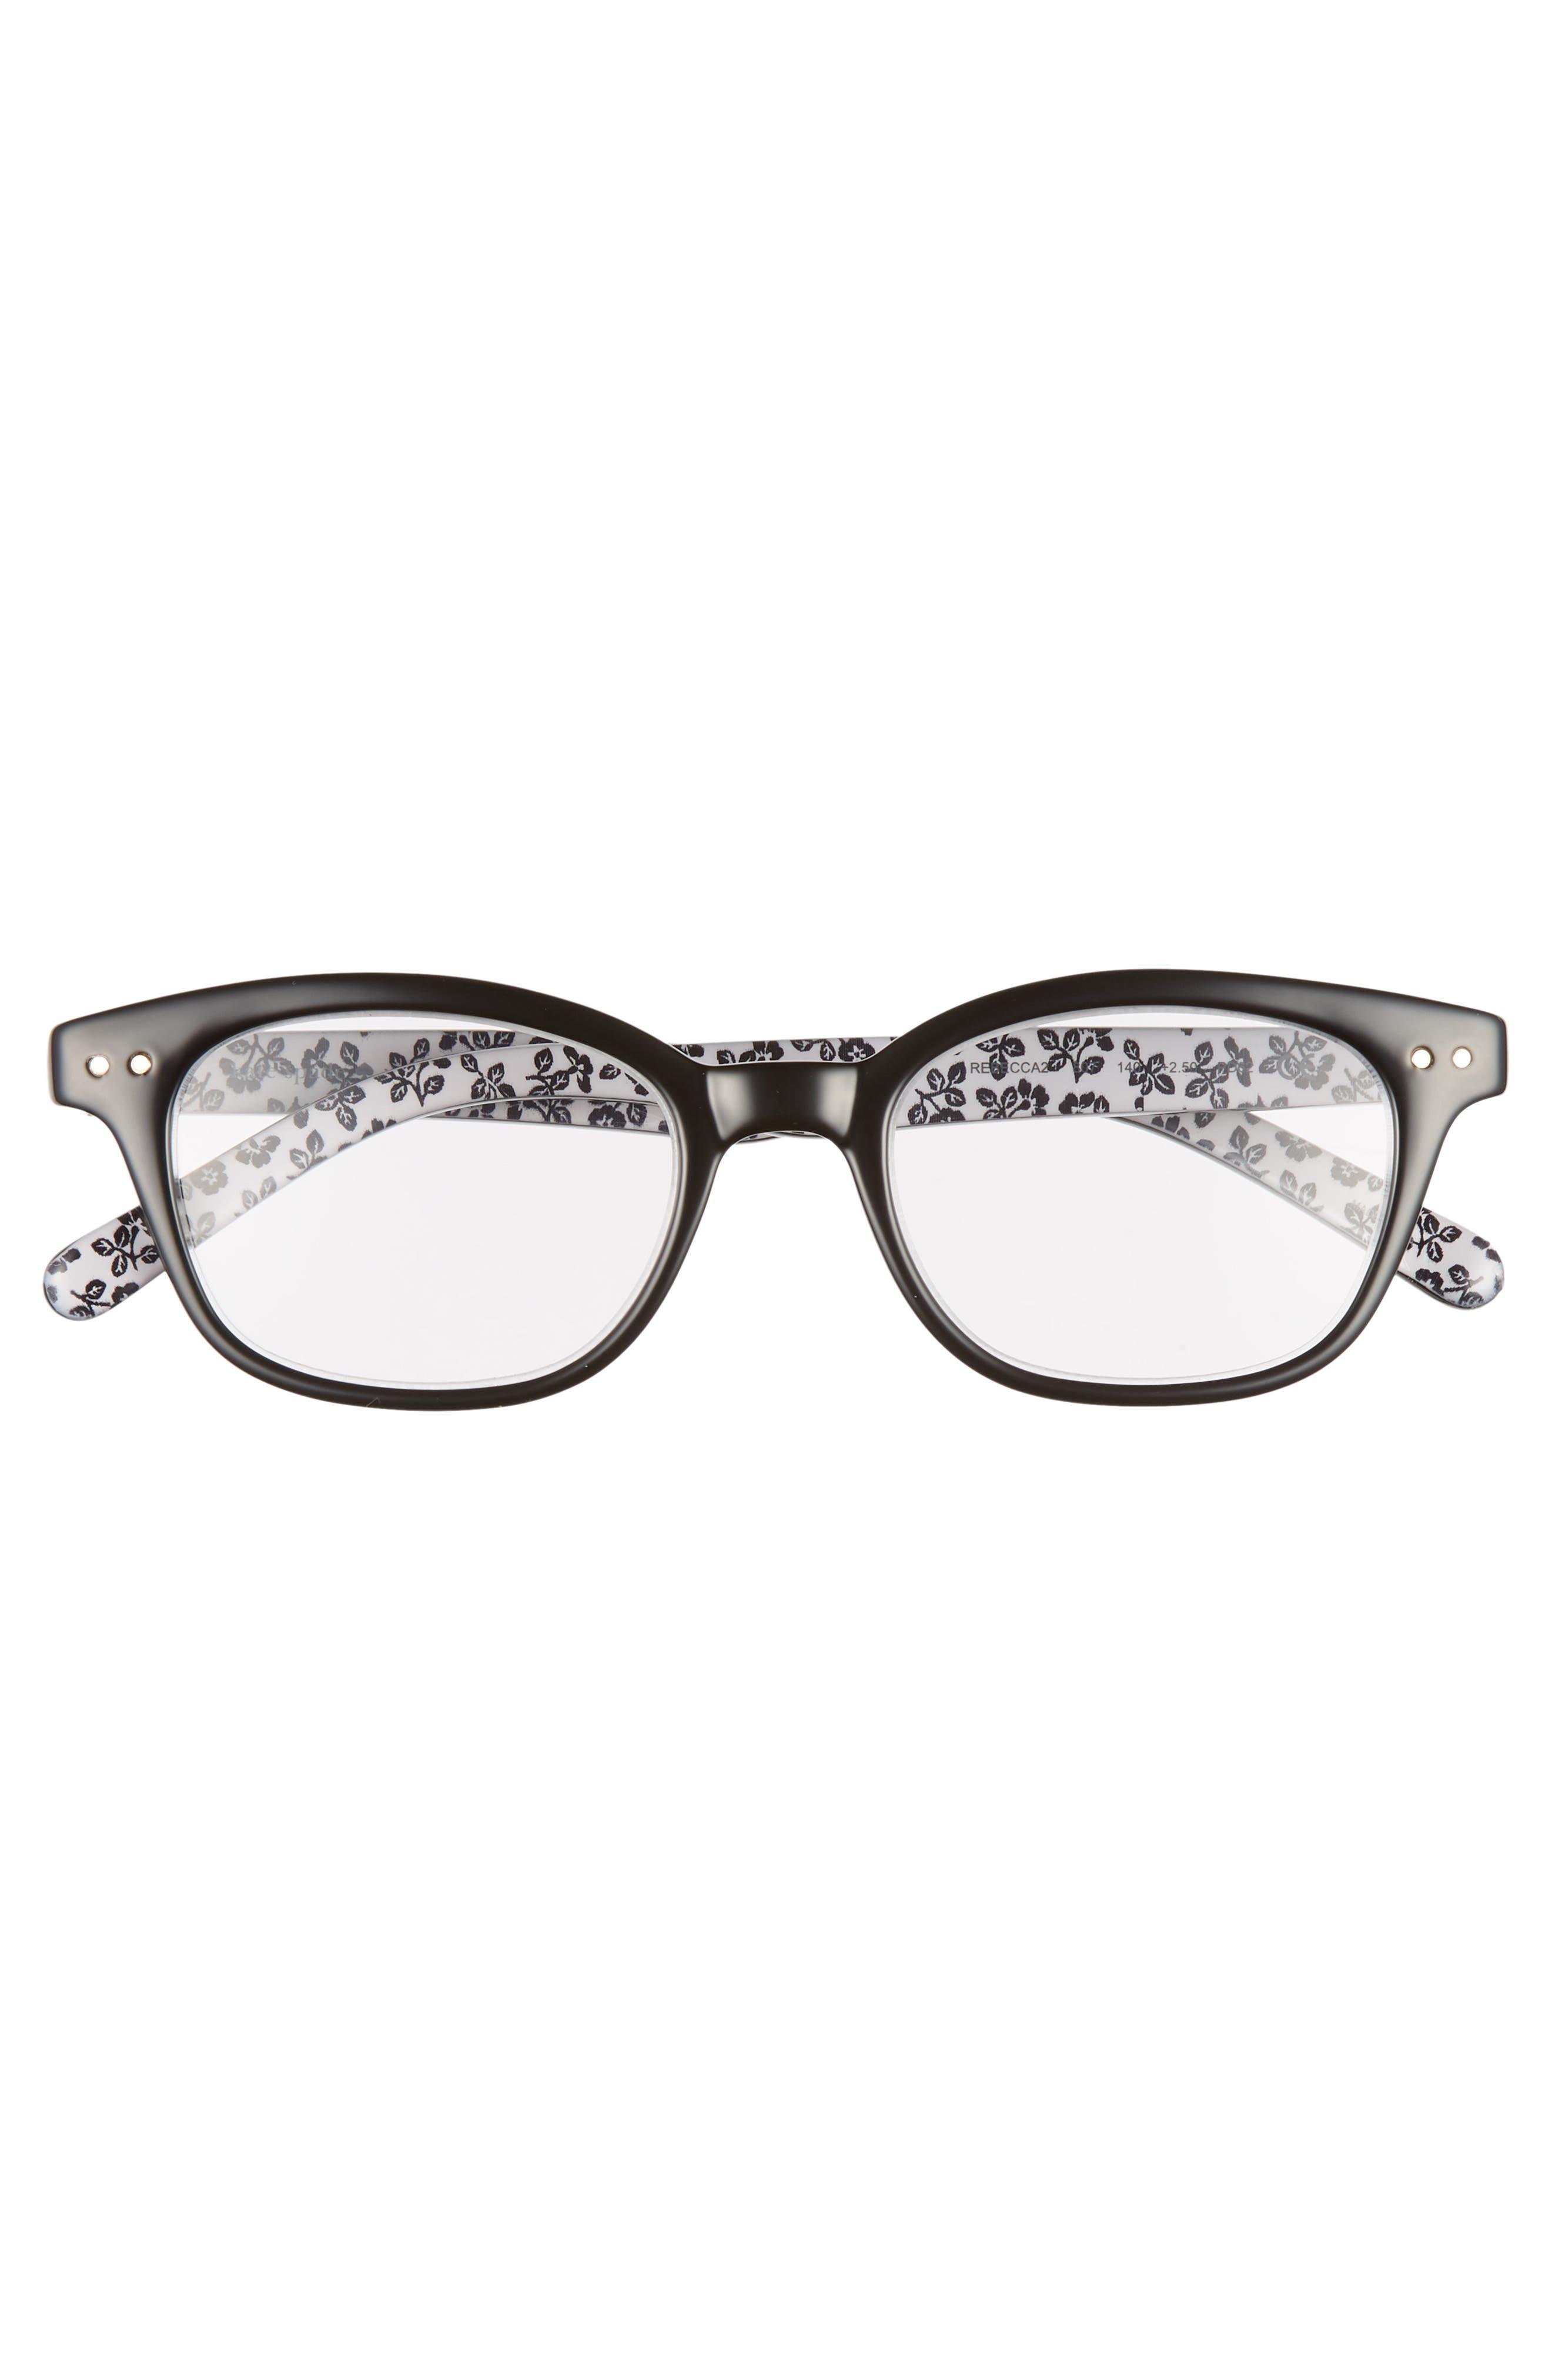 KATE SPADE NEW YORK, rebecca 47mm reading glasses, Alternate thumbnail 3, color, BLACK